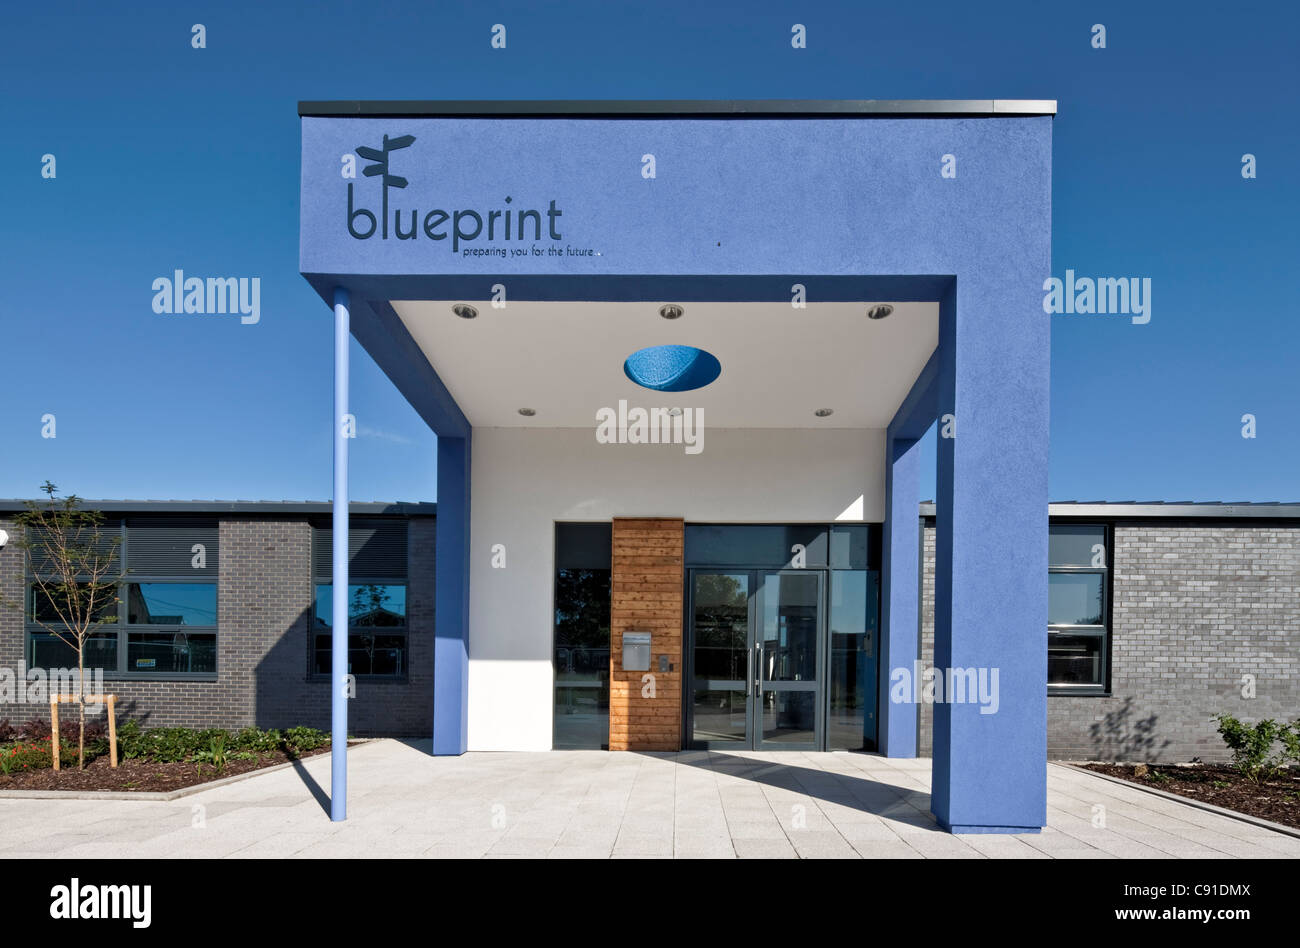 Blueprint Short Stay School in Aylesbury, Buckinghamshire - Stock Image